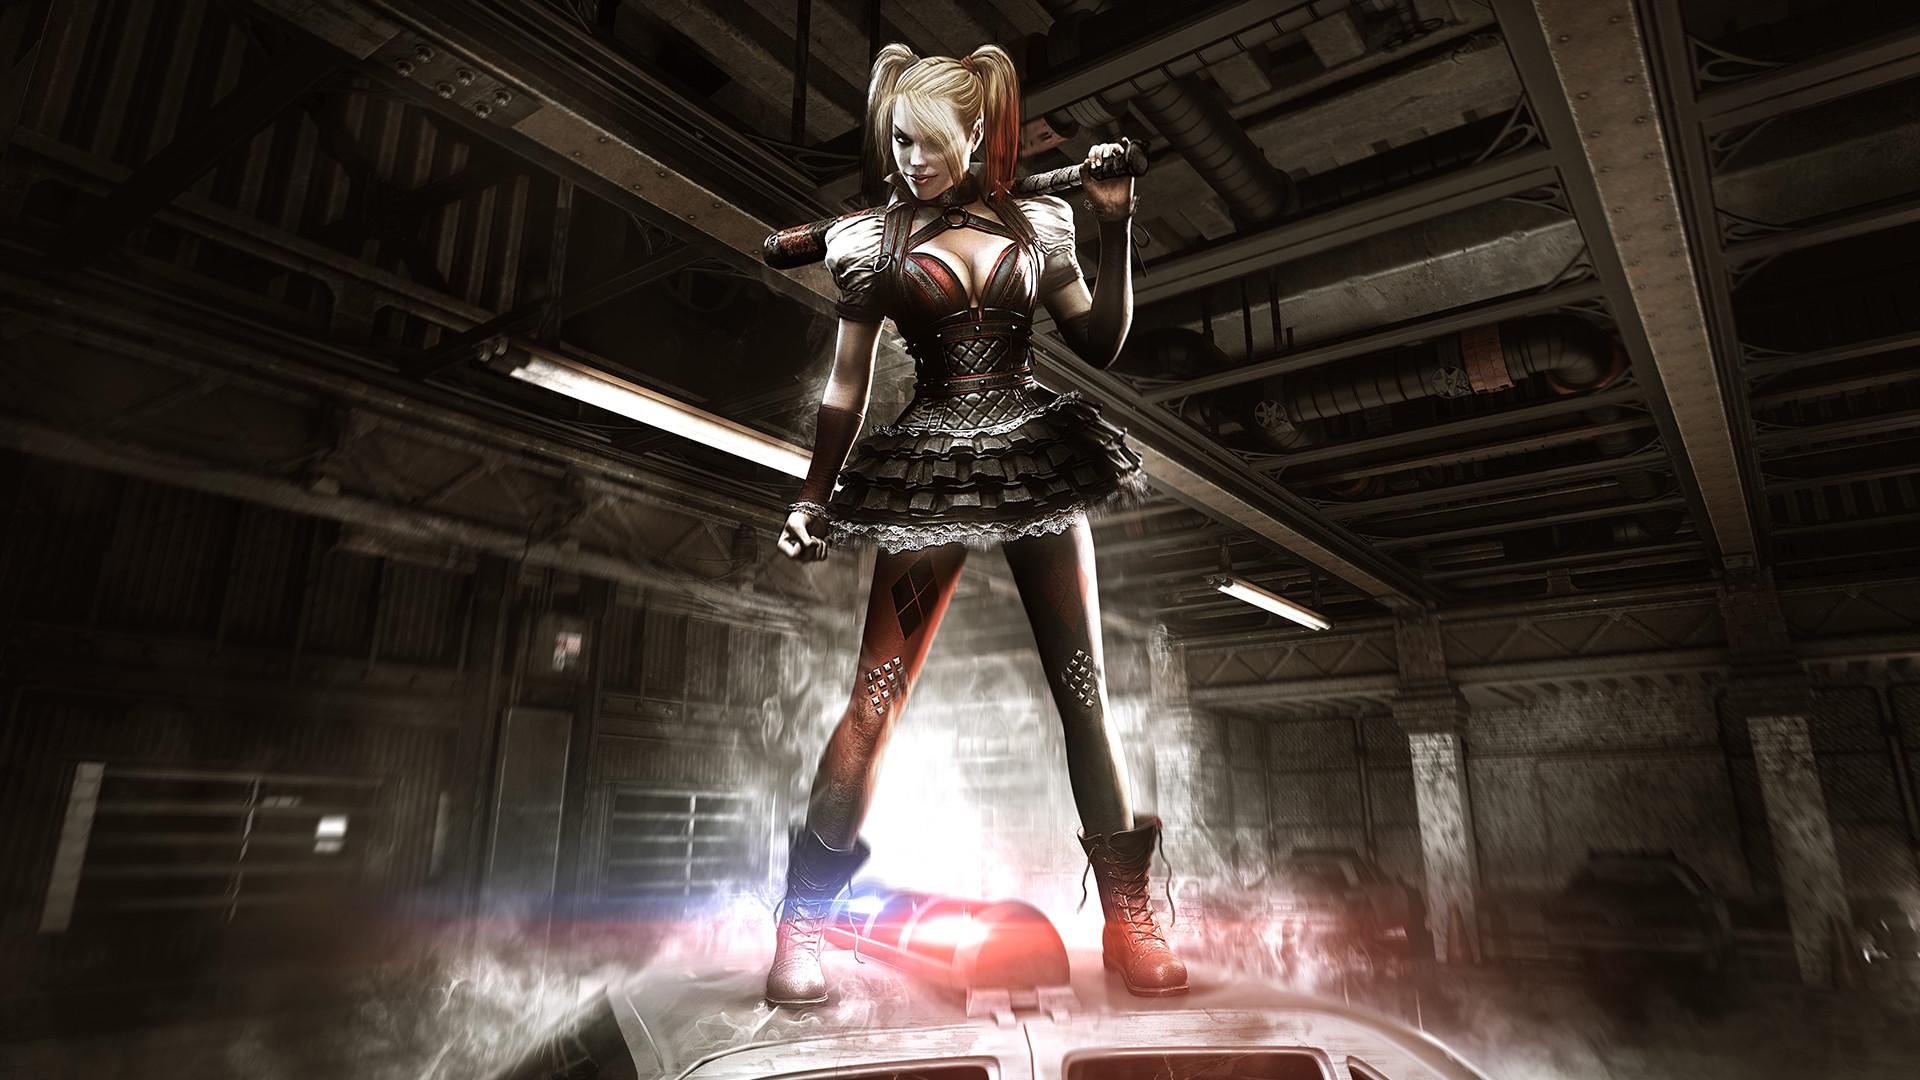 Harley Quinn Batman Arkham Knight Ps4wallpapers Com